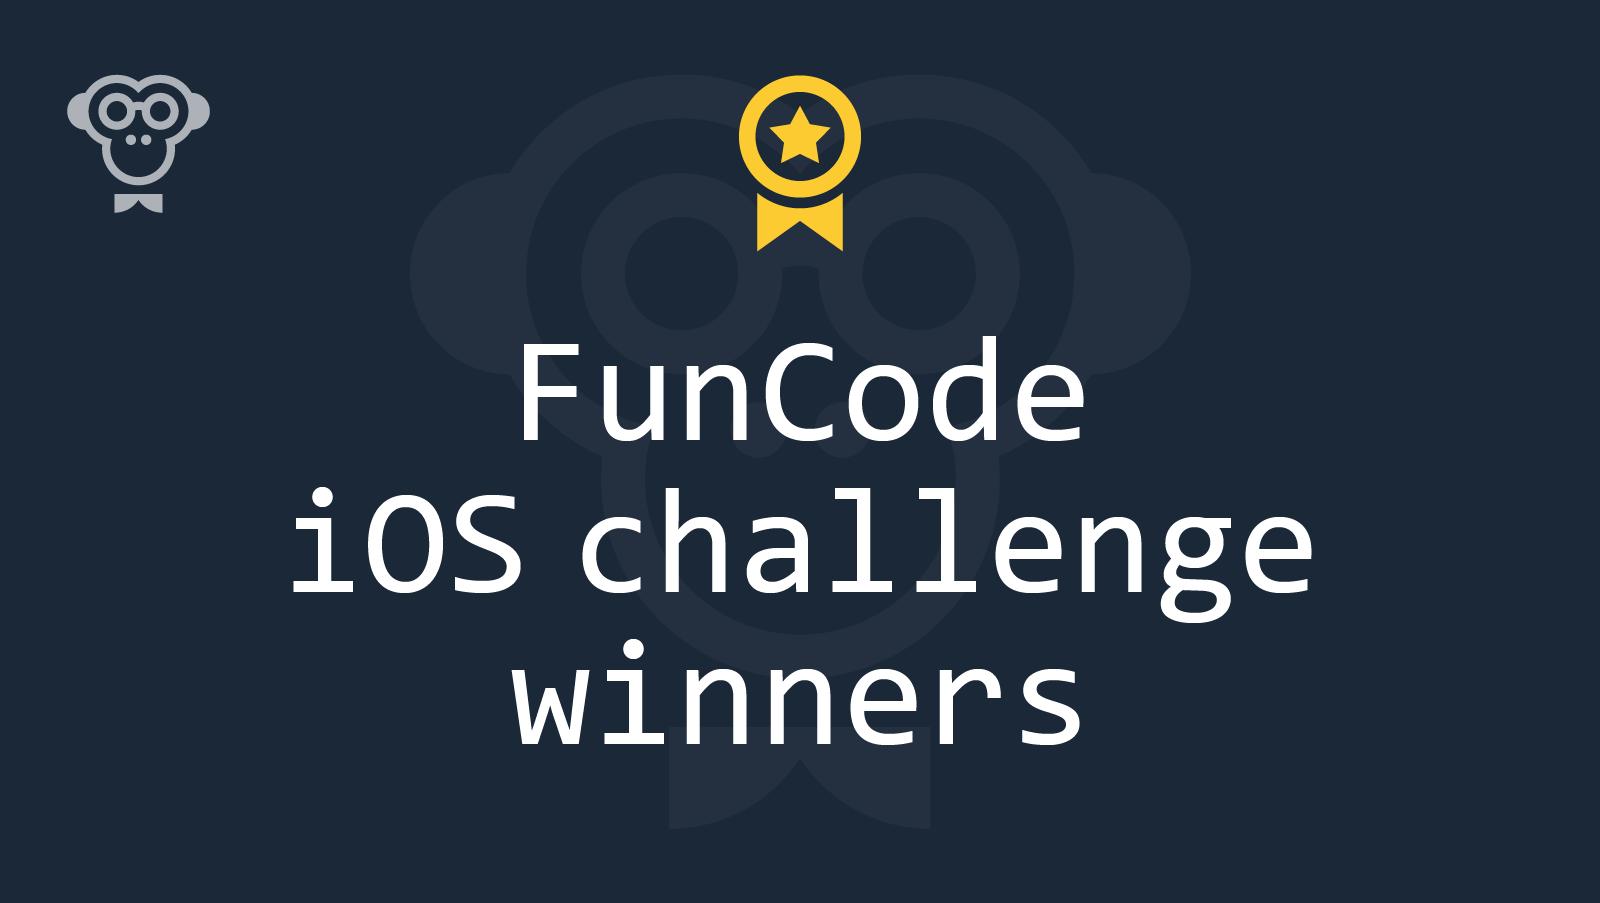 Итоги FunCode iOS challenge: называем имена победителей - 1